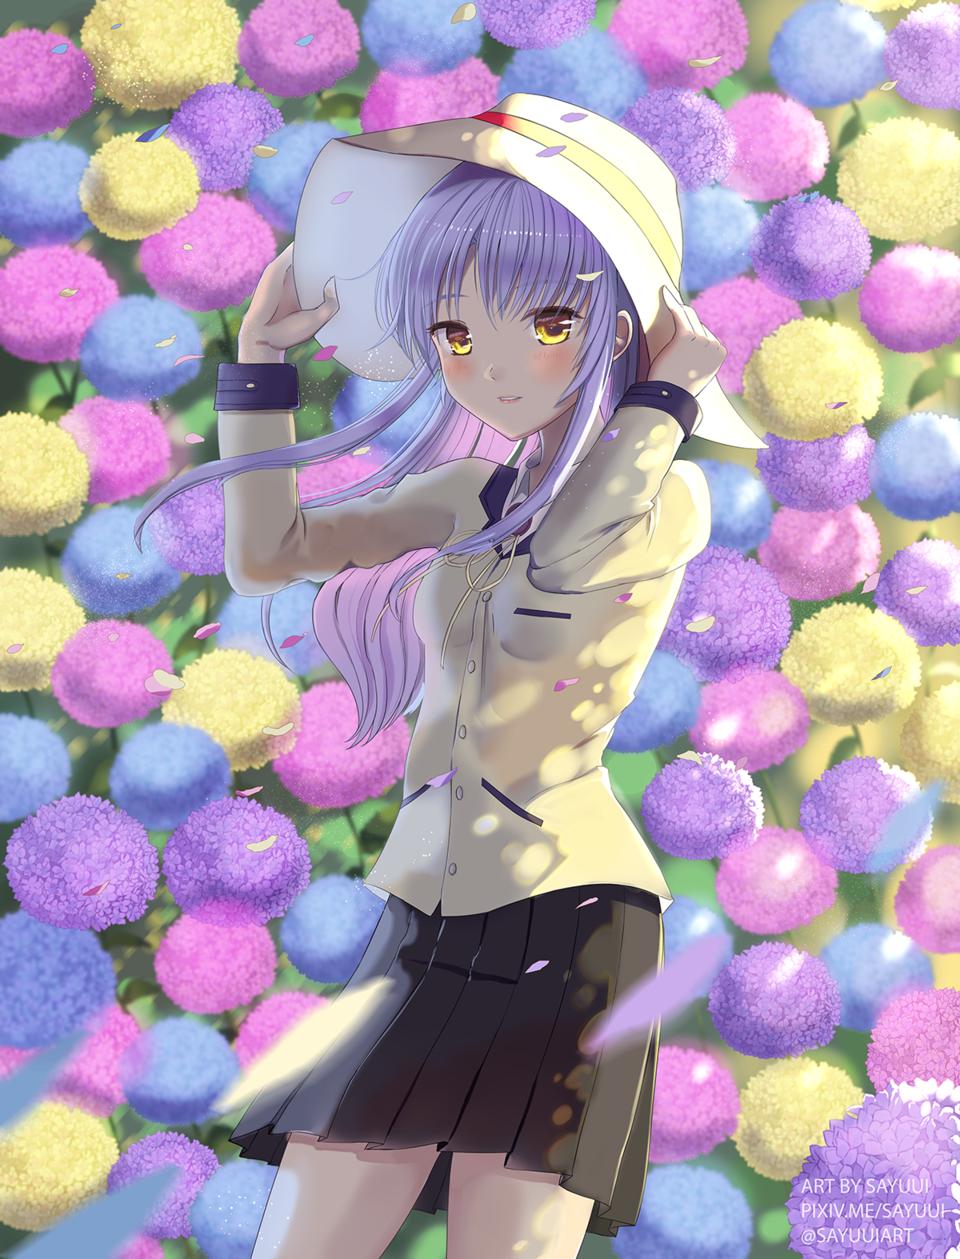 Tachibana Kanade  Illust of Sayuui April2021_Flower hydrangea angel kanade hat flowers AngelBeats! tachibana